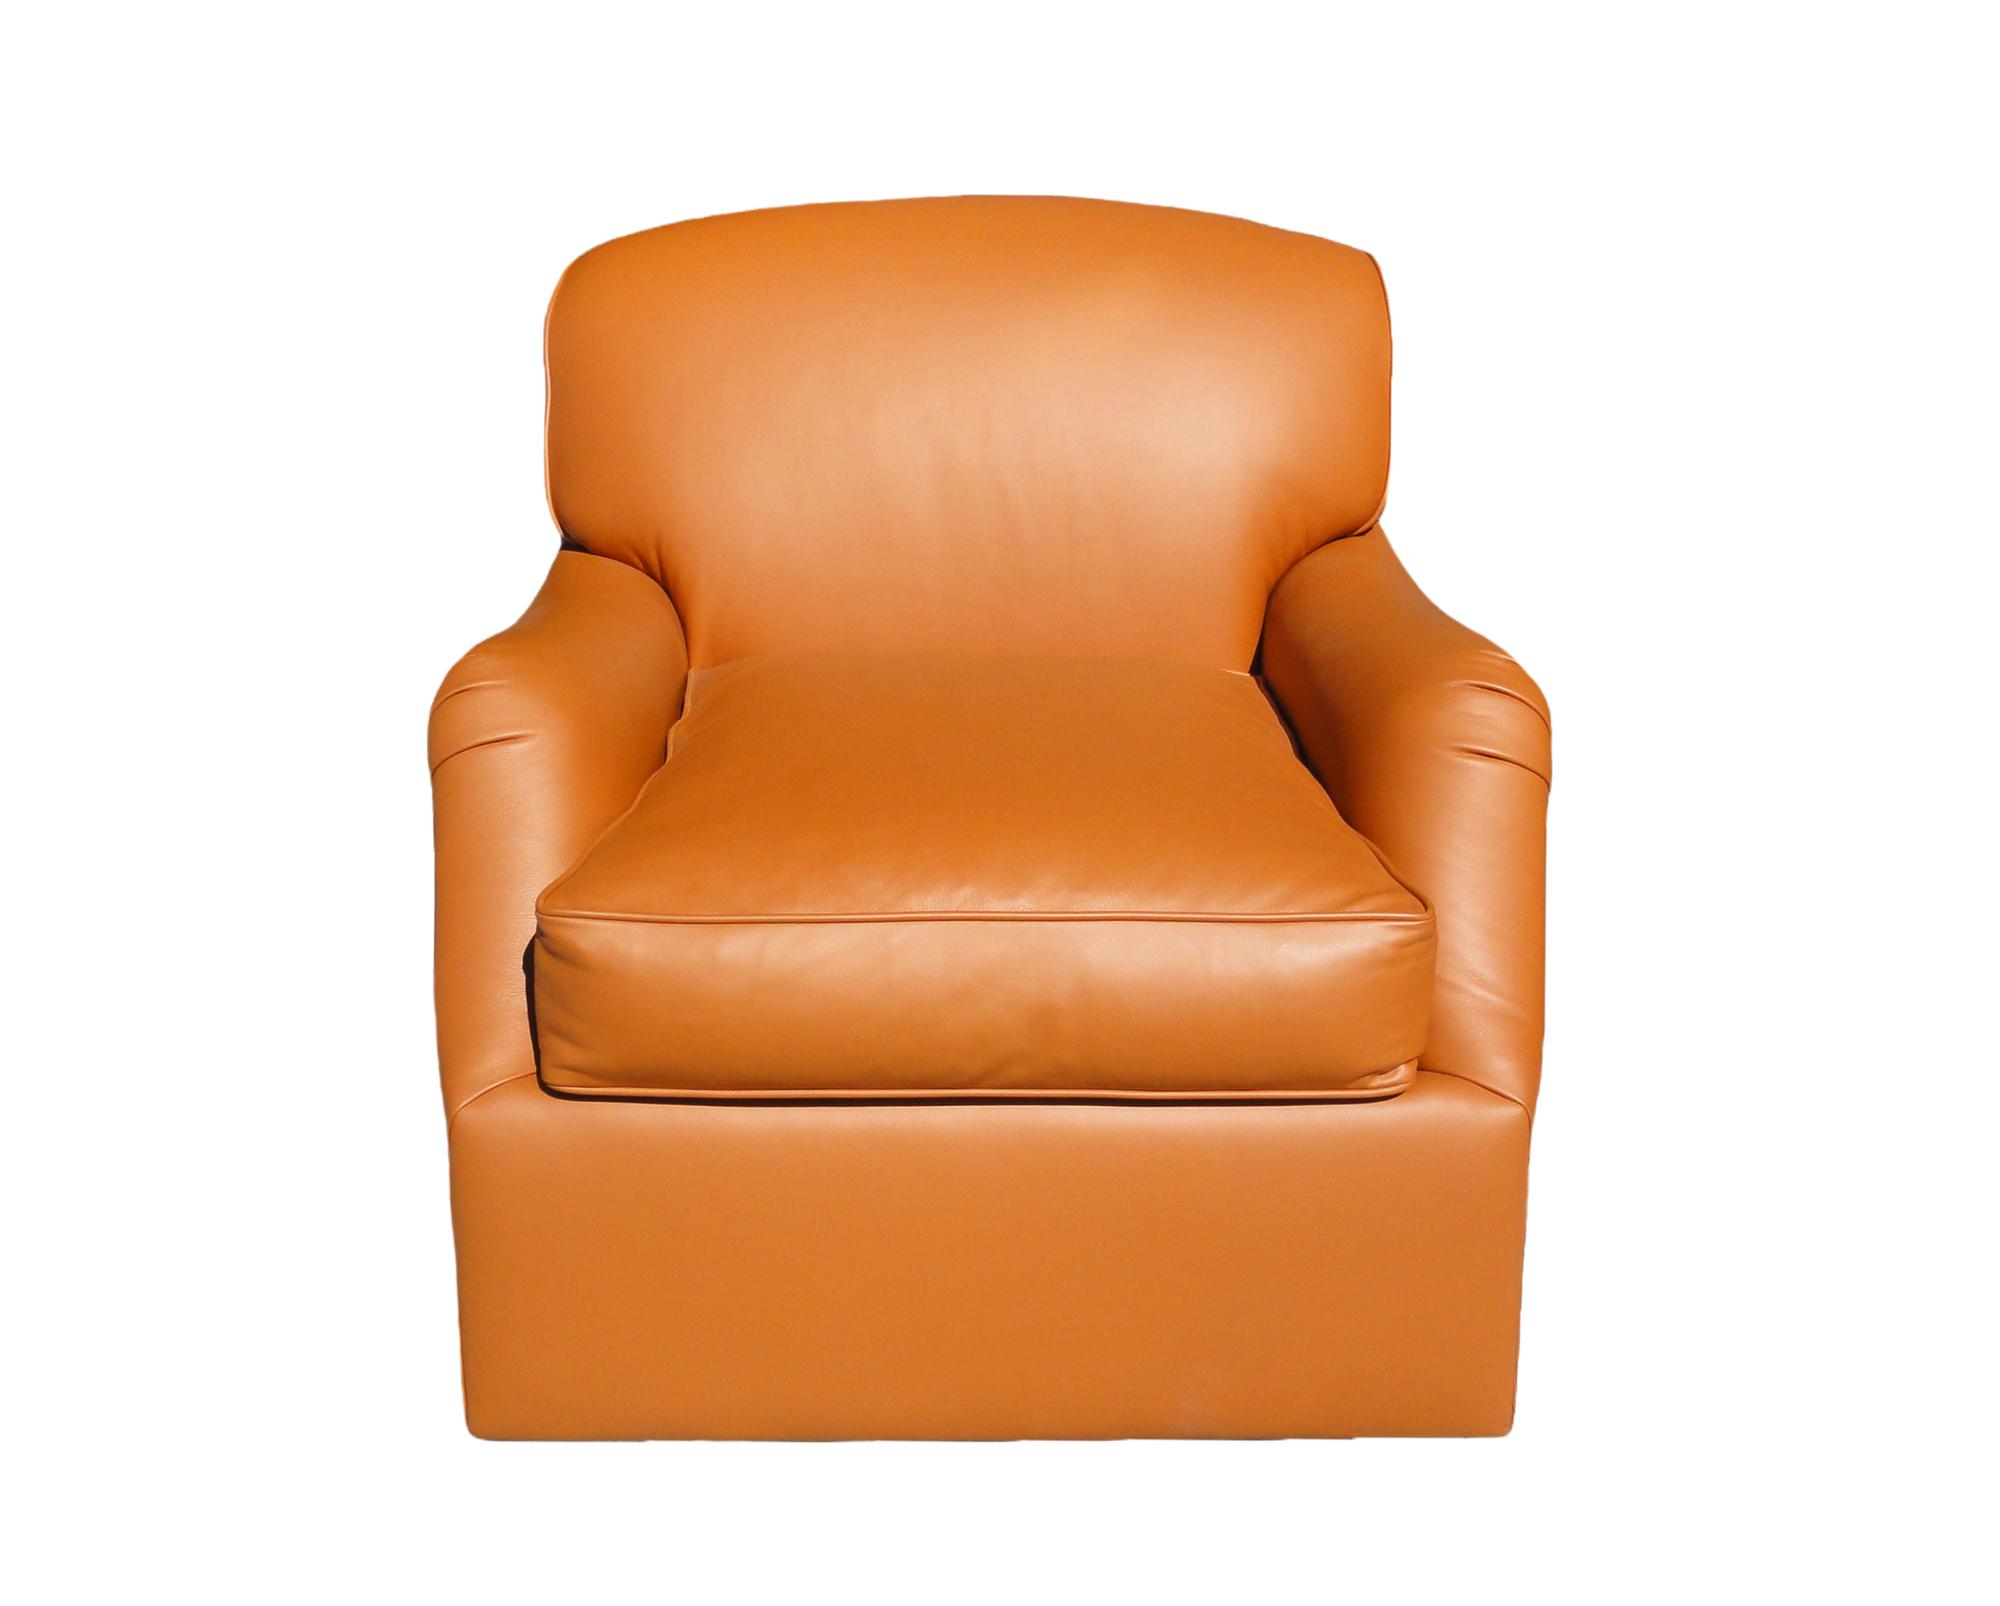 Hermes Leather Swivel Chair santa barbara design center